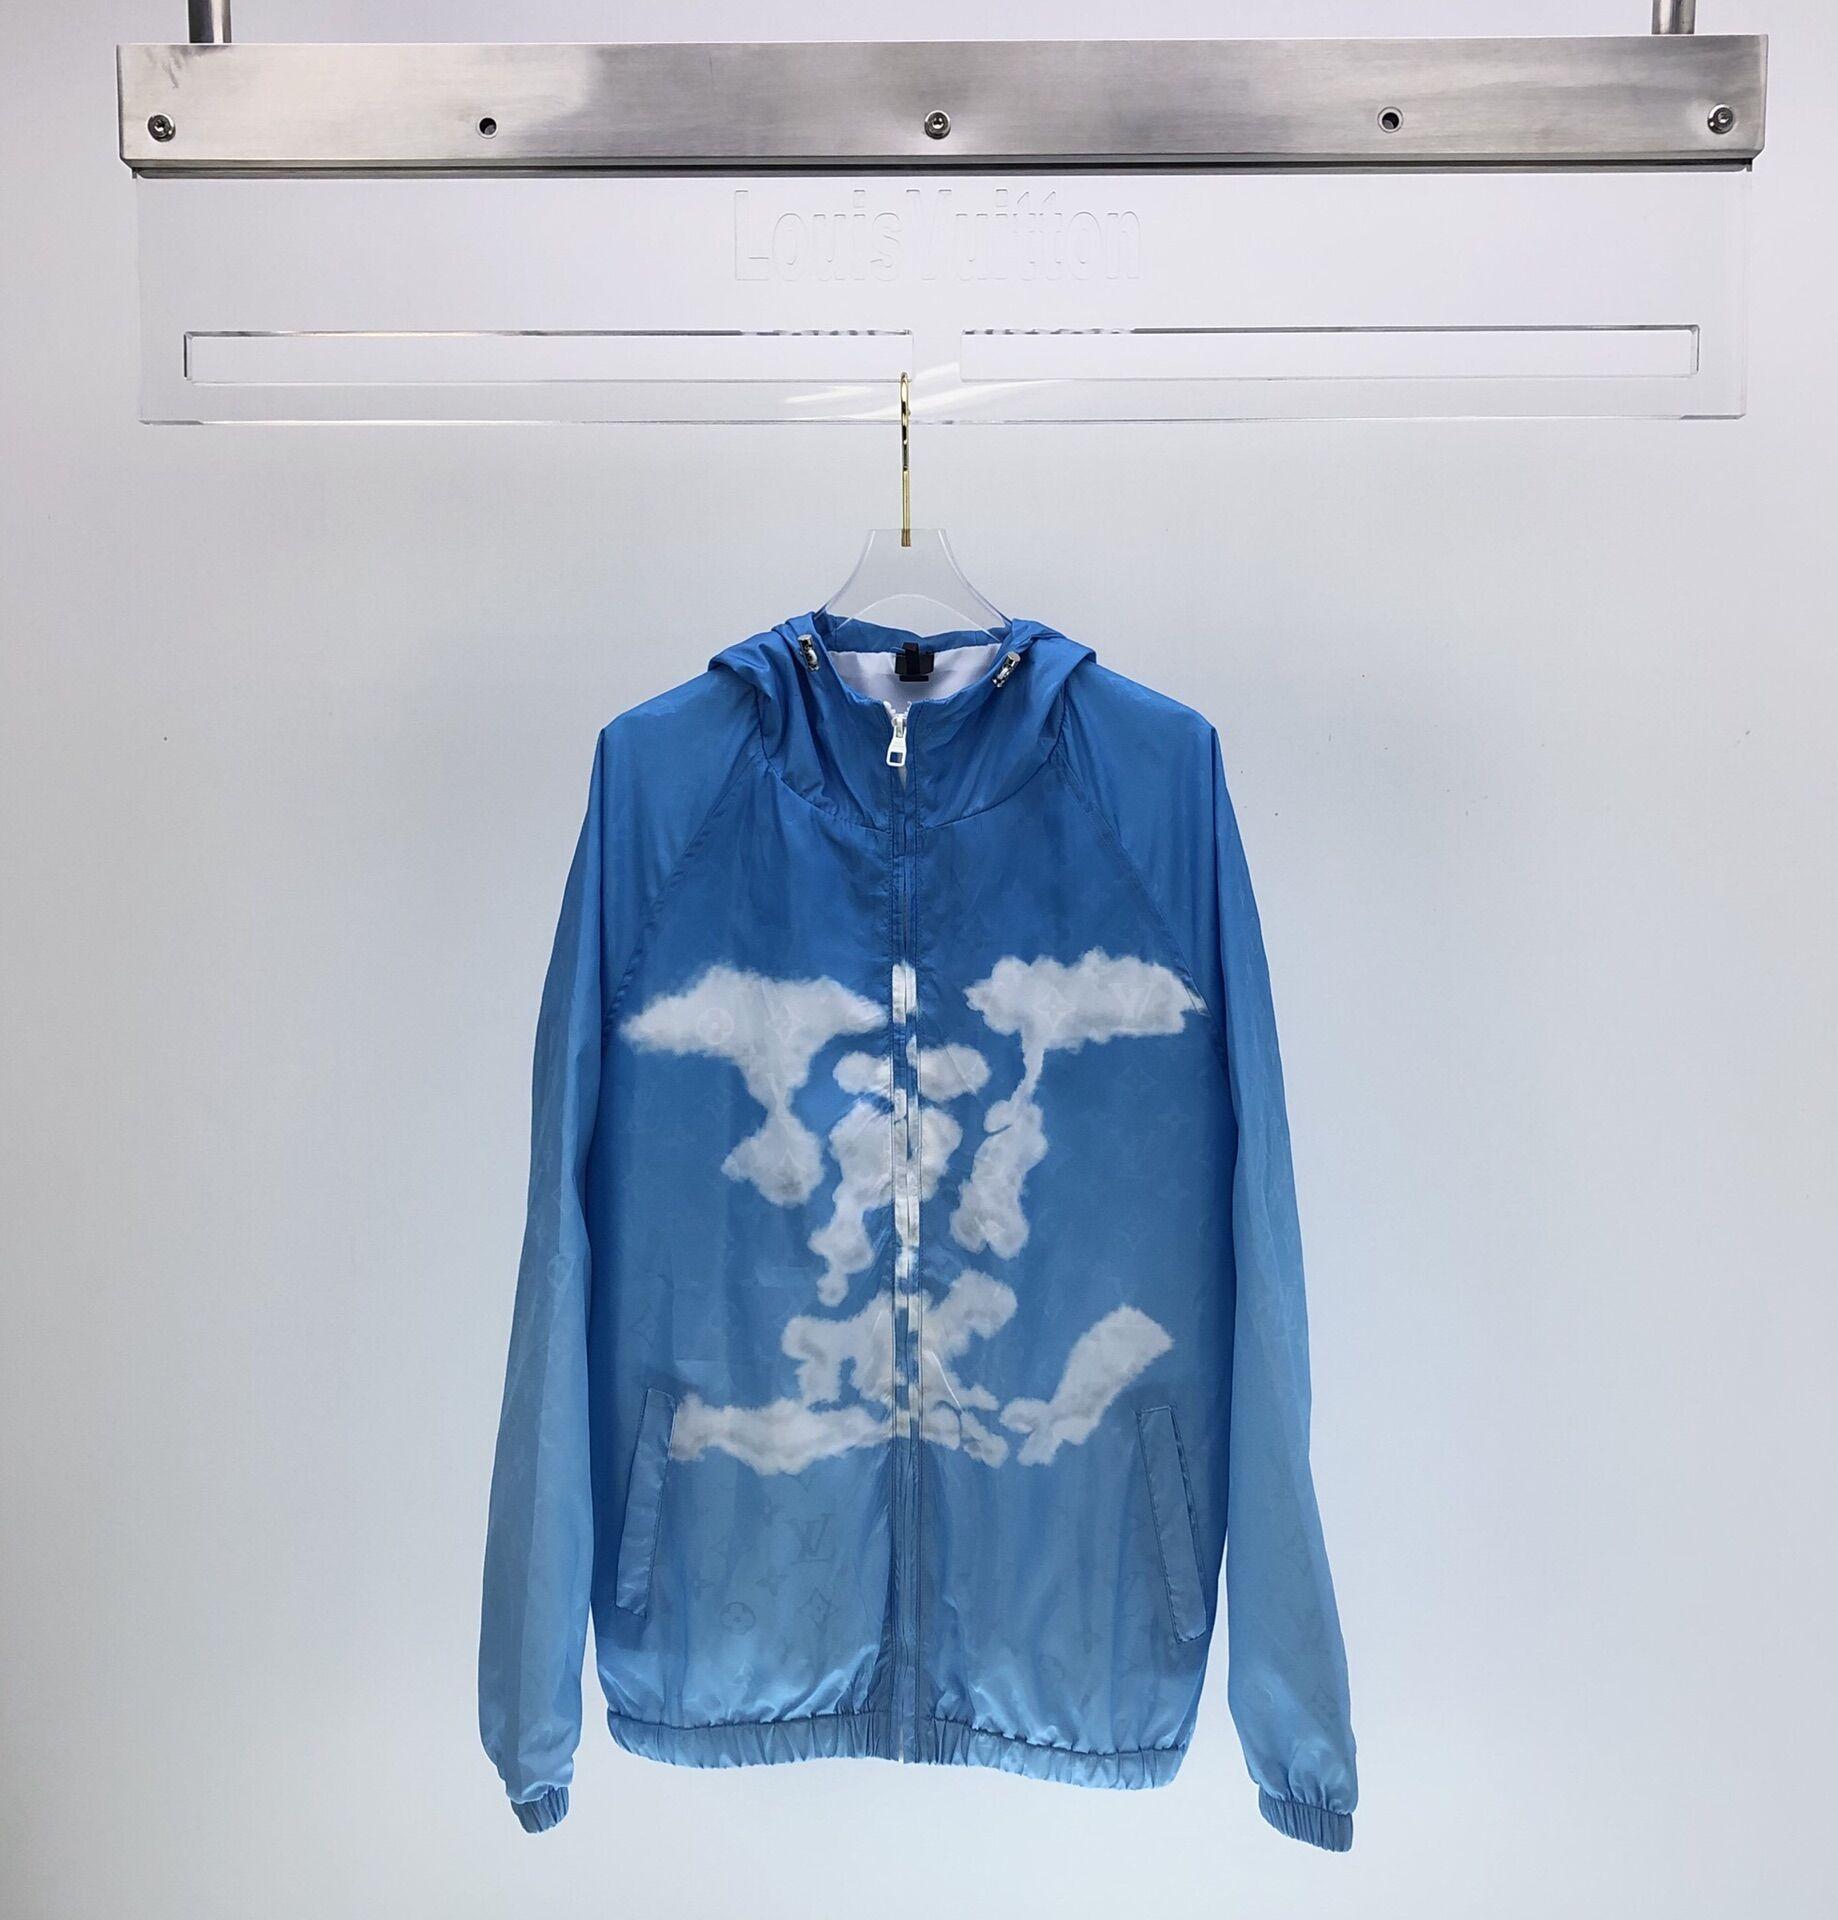 LV MONOGRAM CLOUDS WINDBREAKER lv jacket lv windbreaker  1